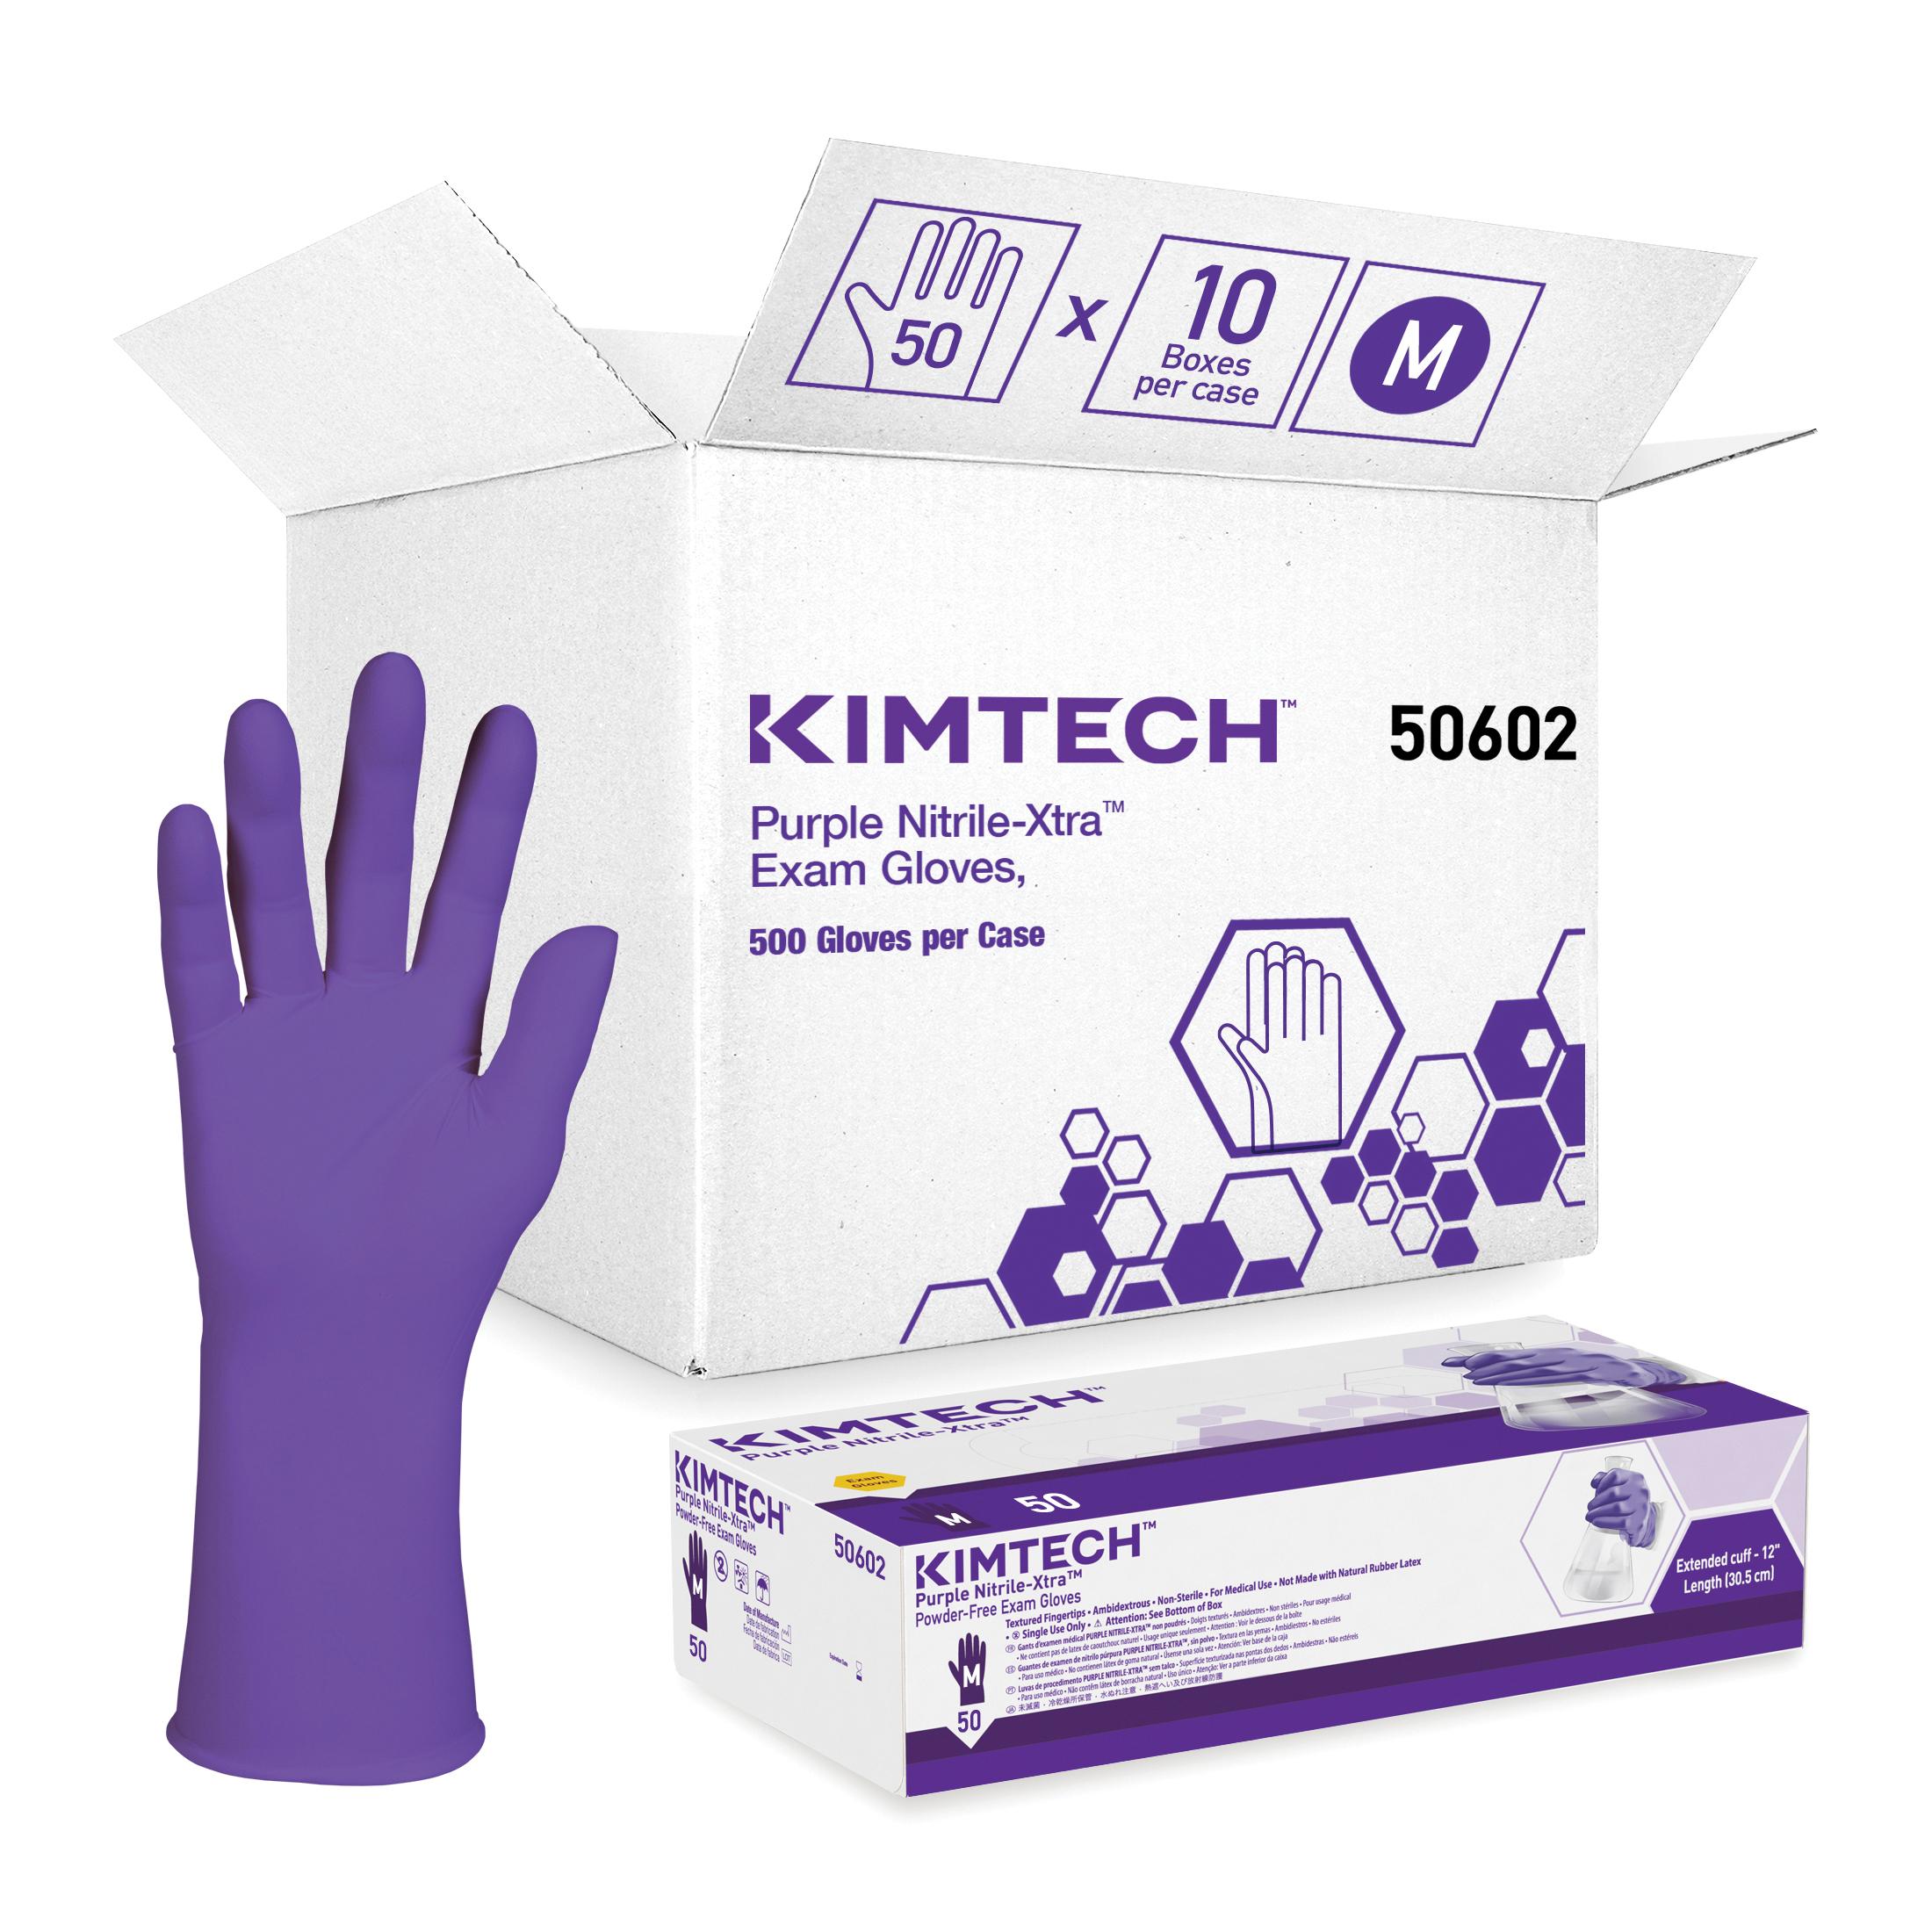 Kimberly-Clark* Fluidsheild* 47137 Pleat Style Procedure Mask With Clear Splashguard* Anti-Glare Visor, Universal, Resists: Fluid and Fog